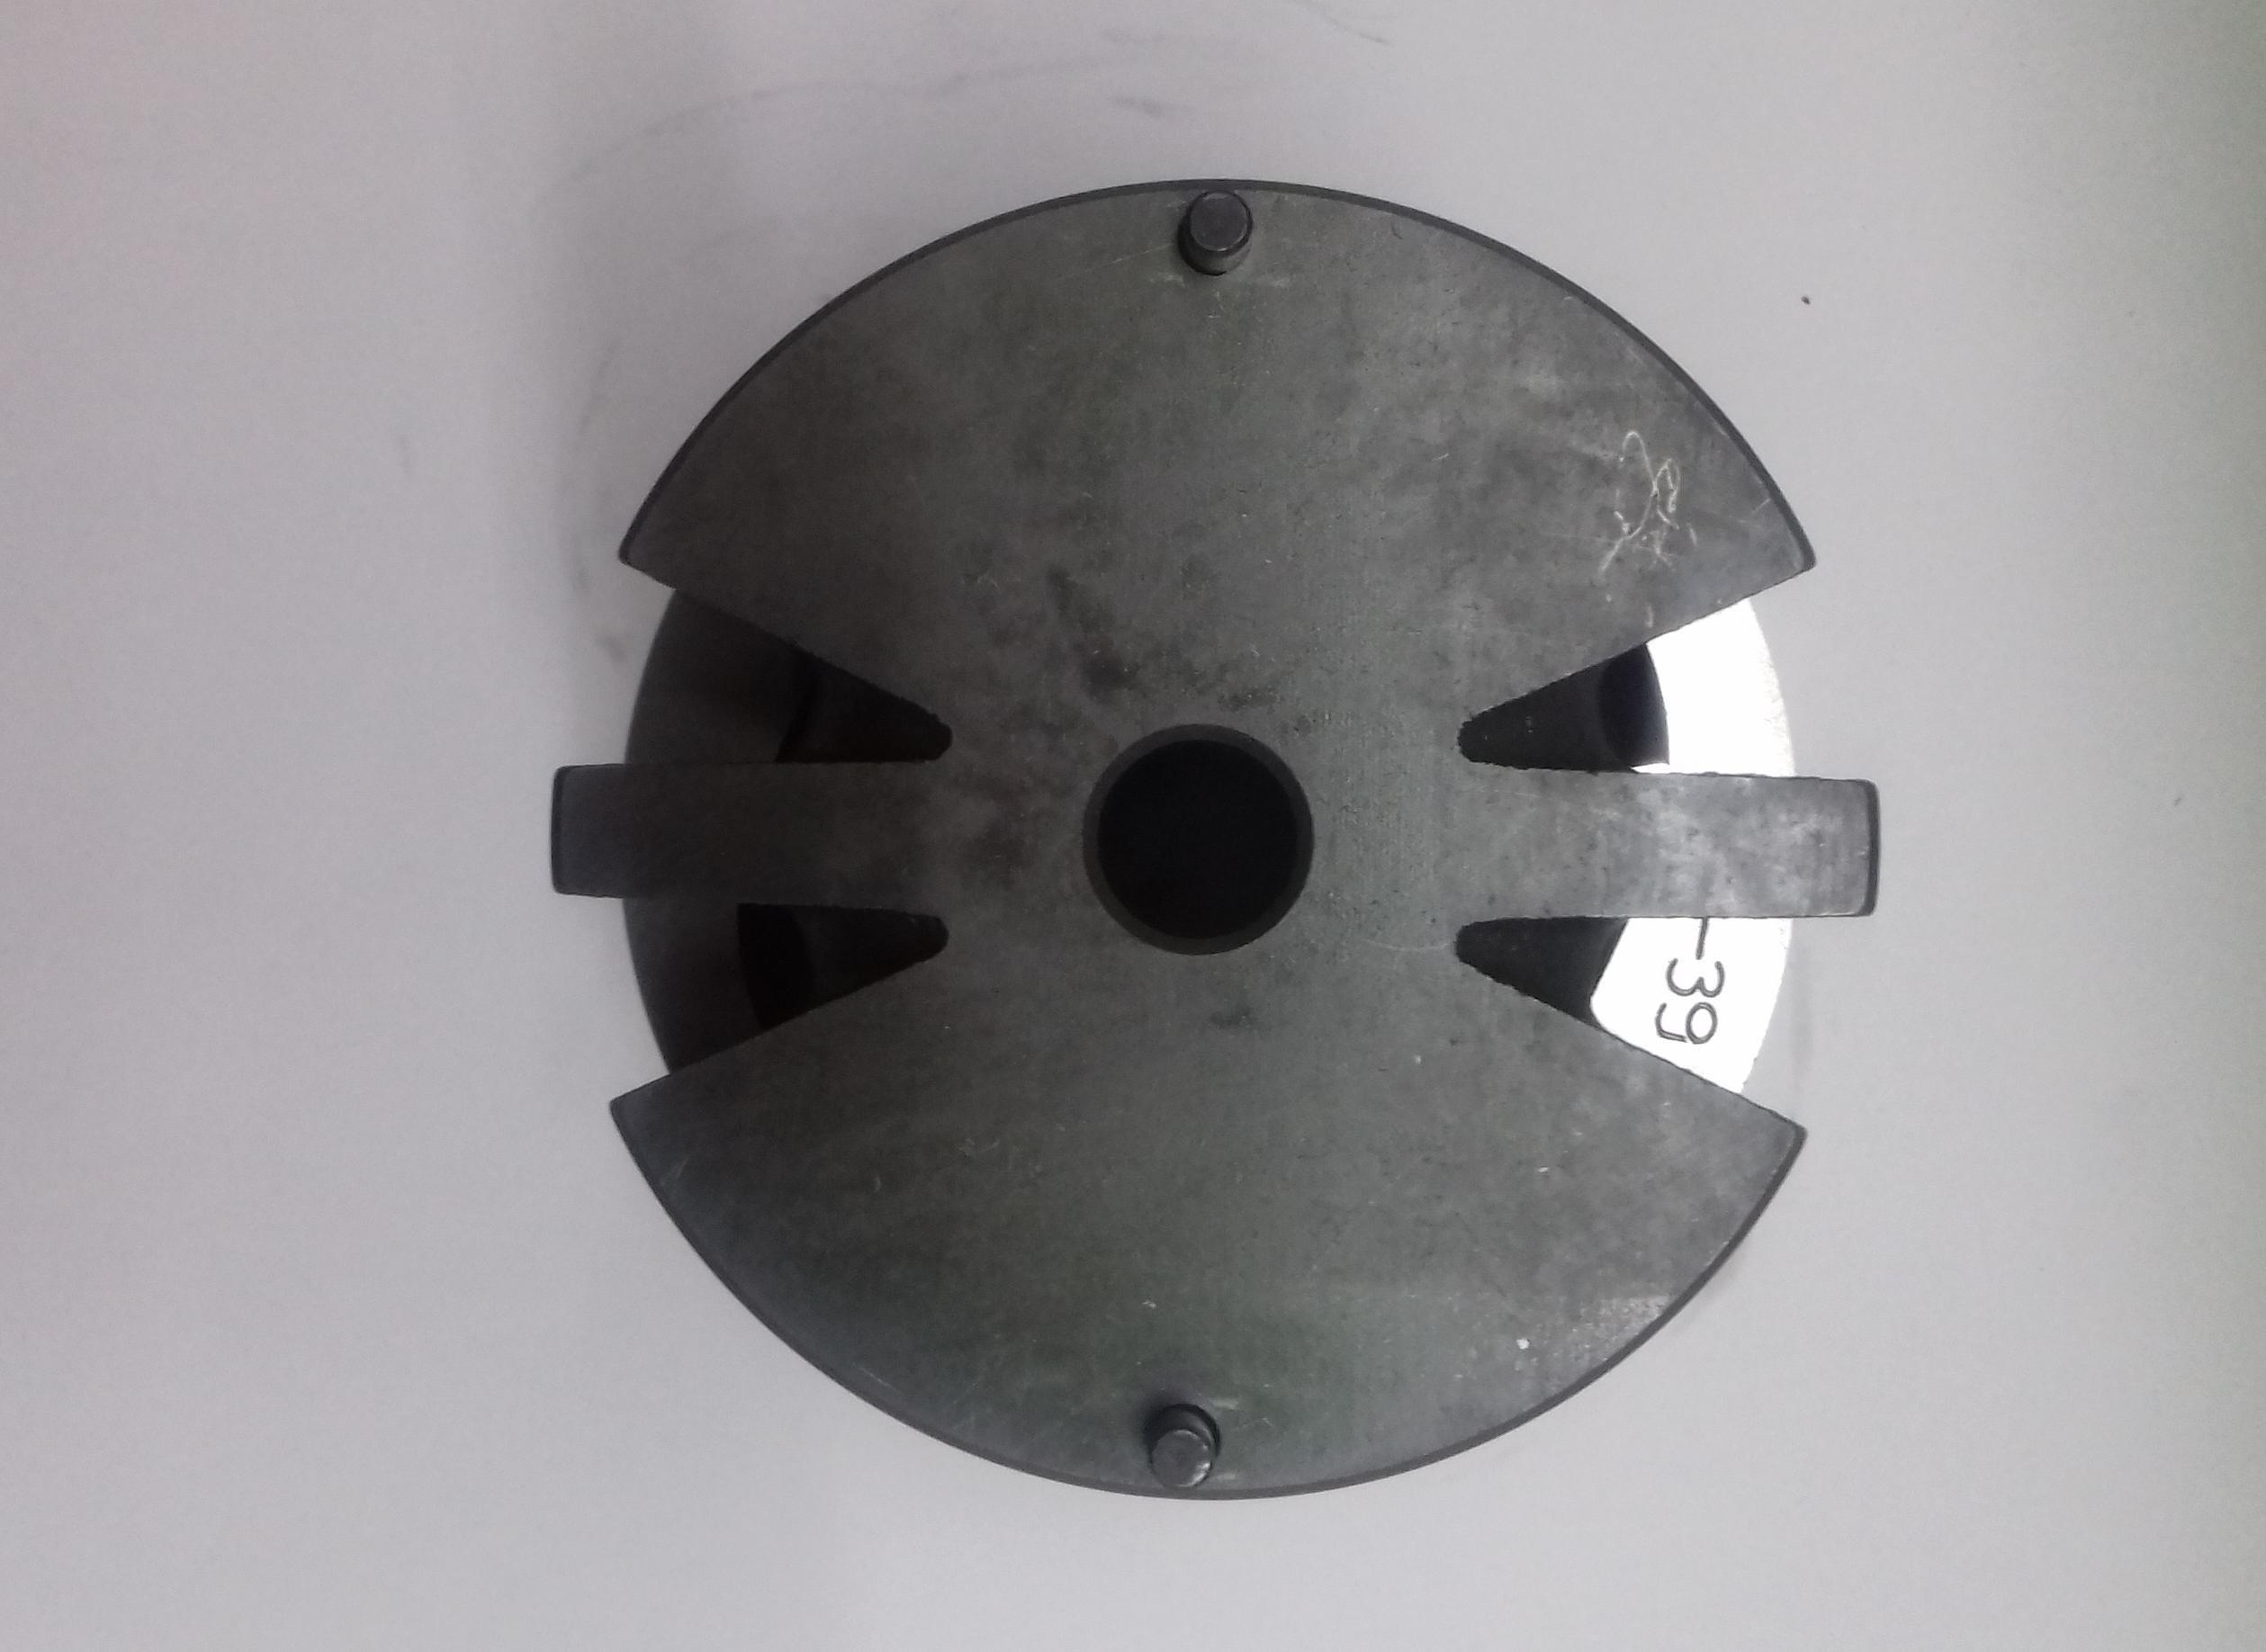 Yuken Hydraulic Vane Pump Spares Catridige Kit CPVR50-39-R-31